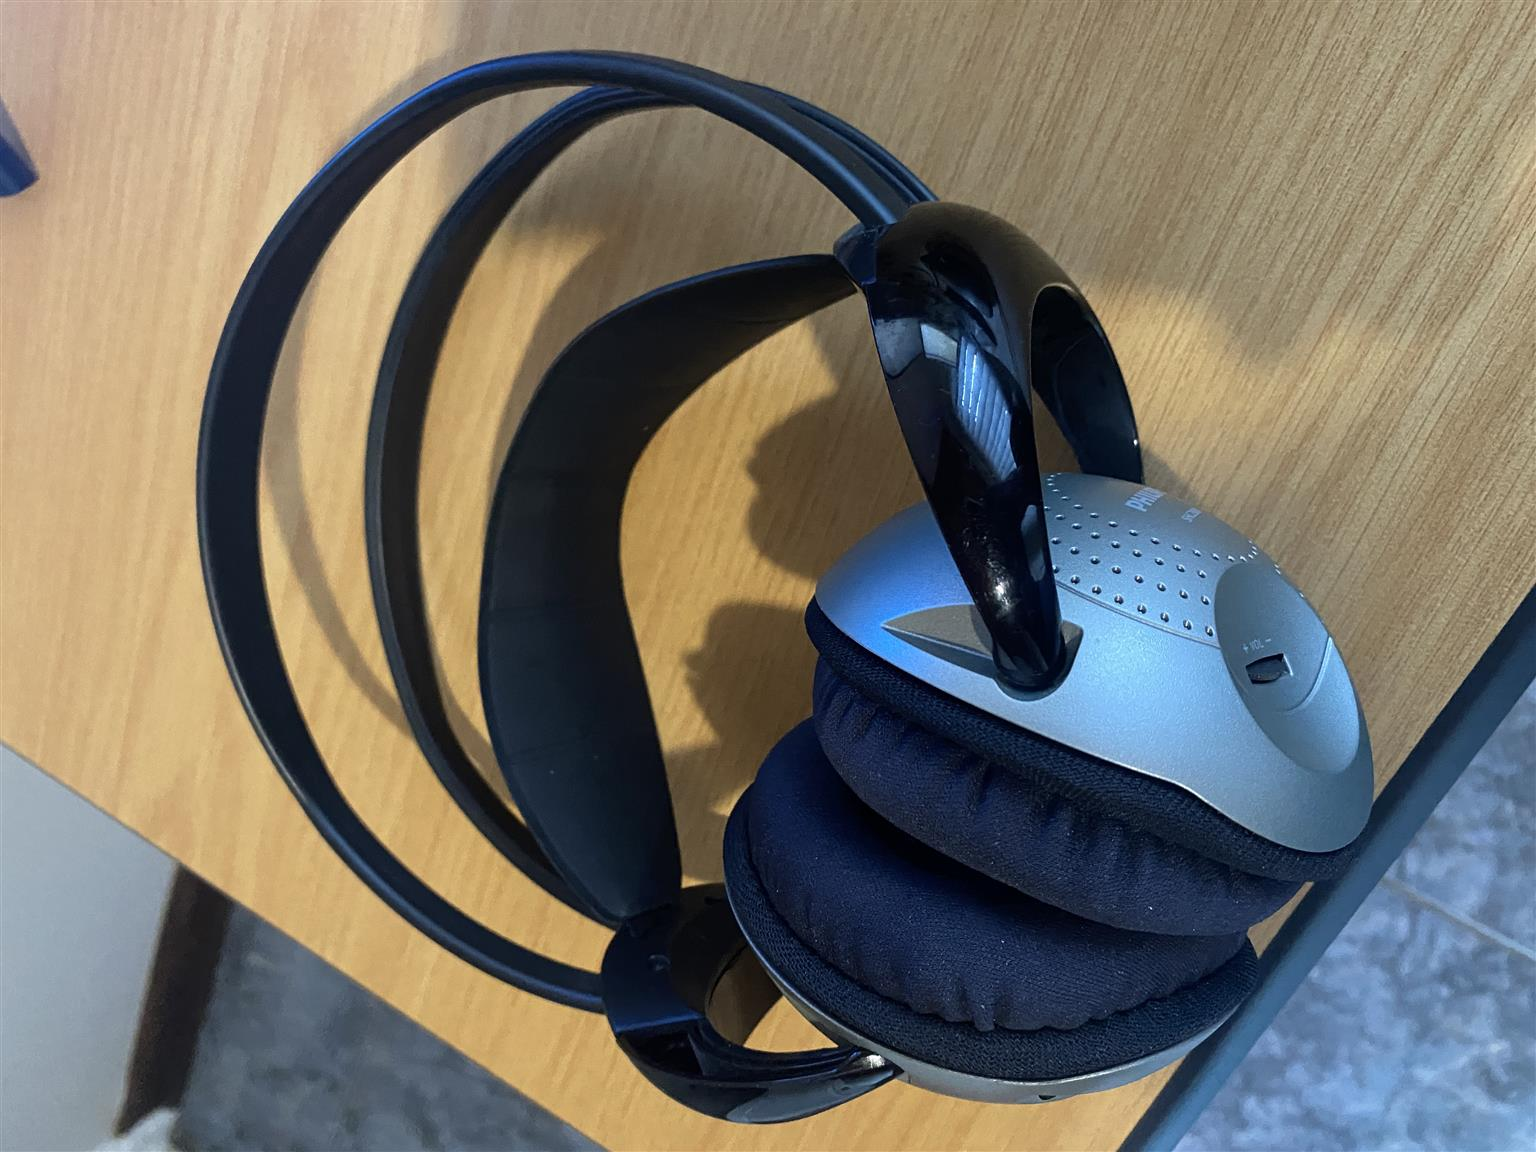 Philips wireless IR headphones